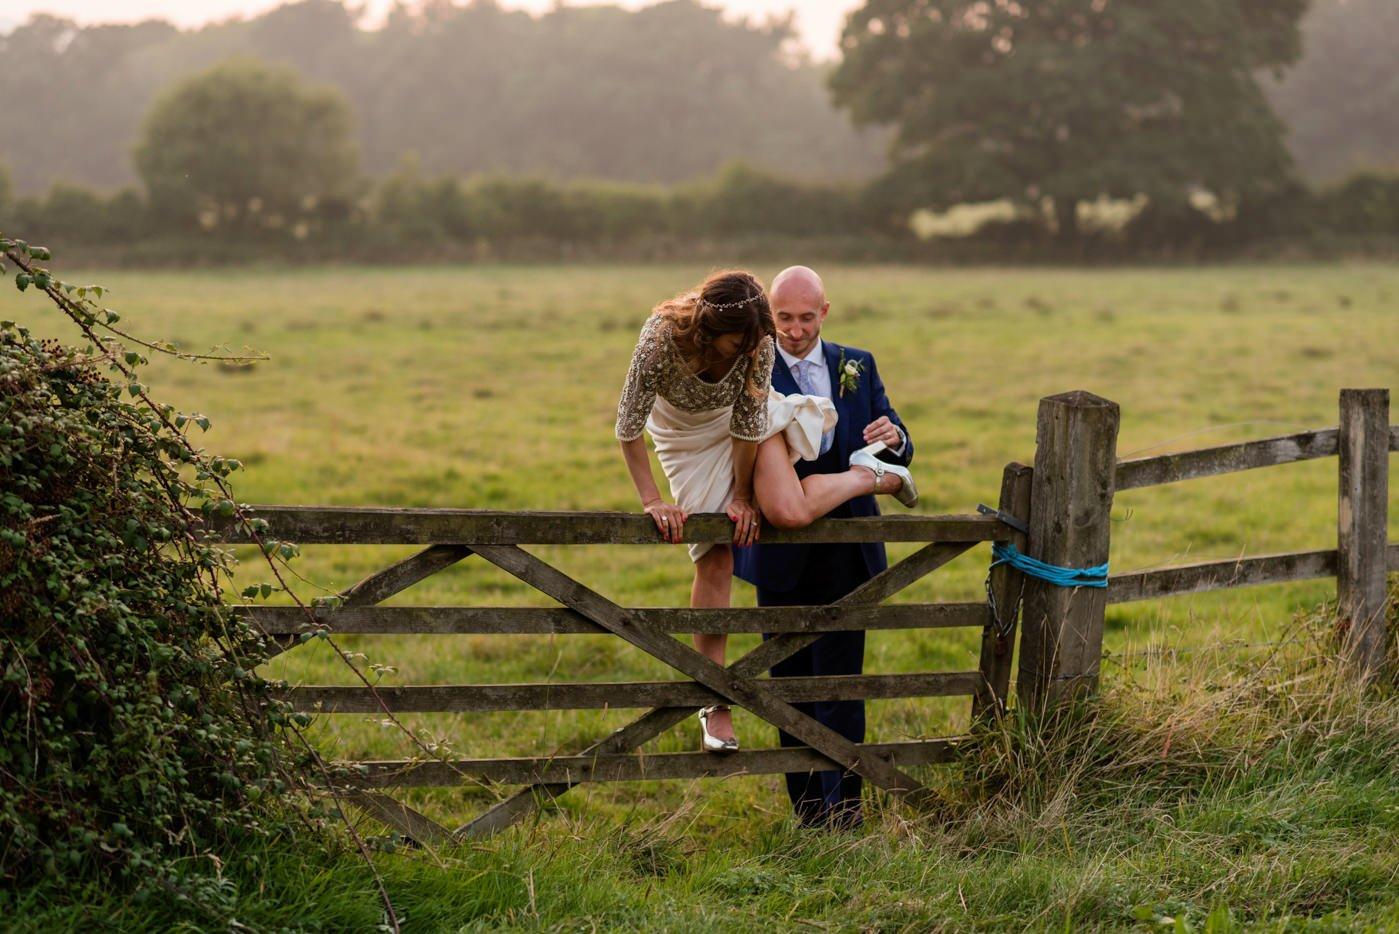 bignor-park-wedding-photography-robyn-and-tom-105